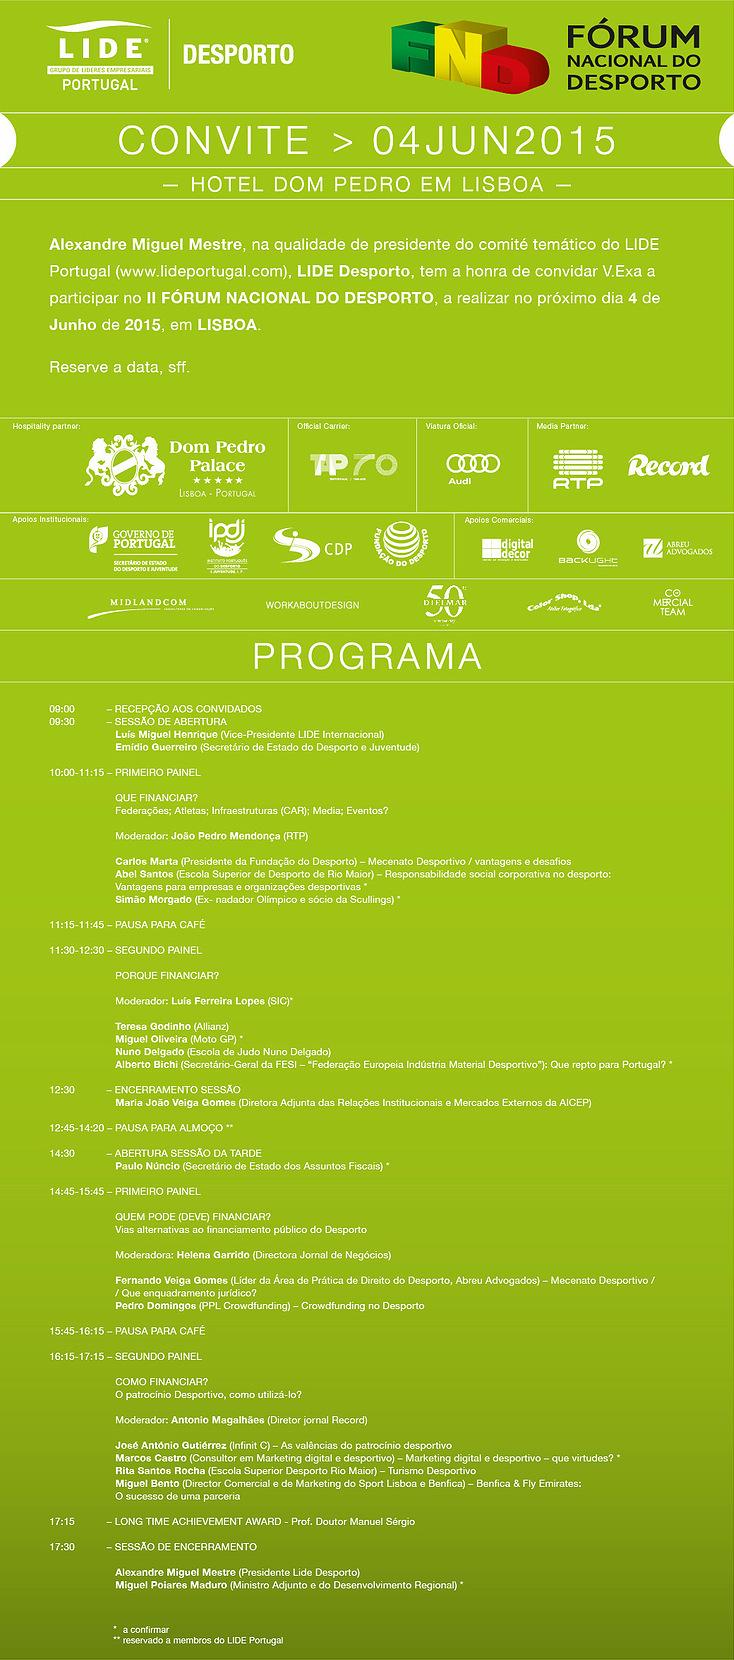 Programa LIDE Desporto Forum Nacional do Desporto